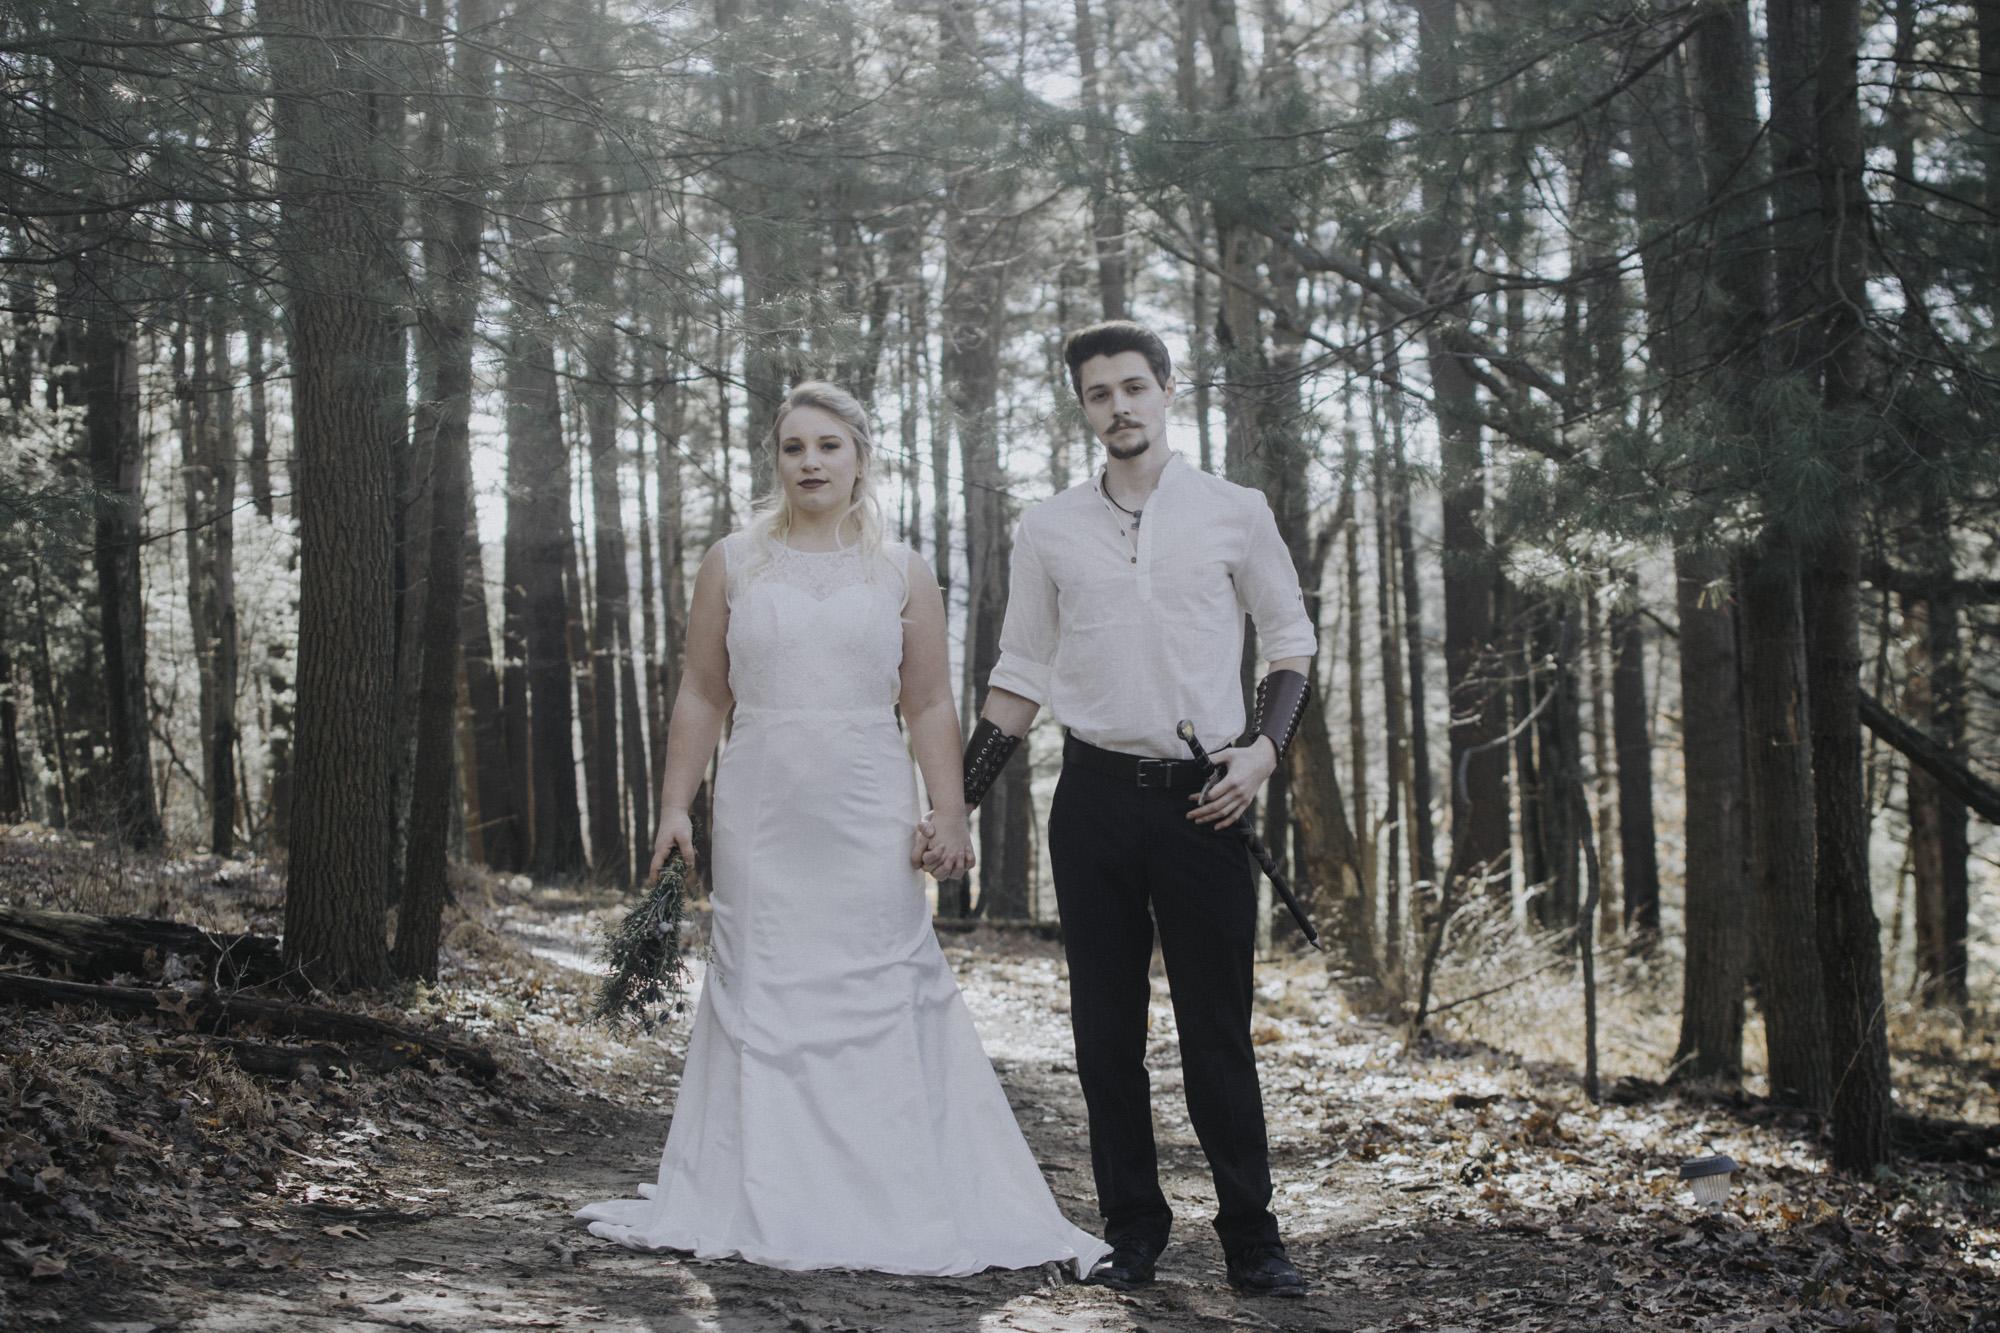 Cate_Ann_Photography_Dayton_Ohio_Wedding_Elopement_And_Engagement_PhotographerDSC_6354.jpg